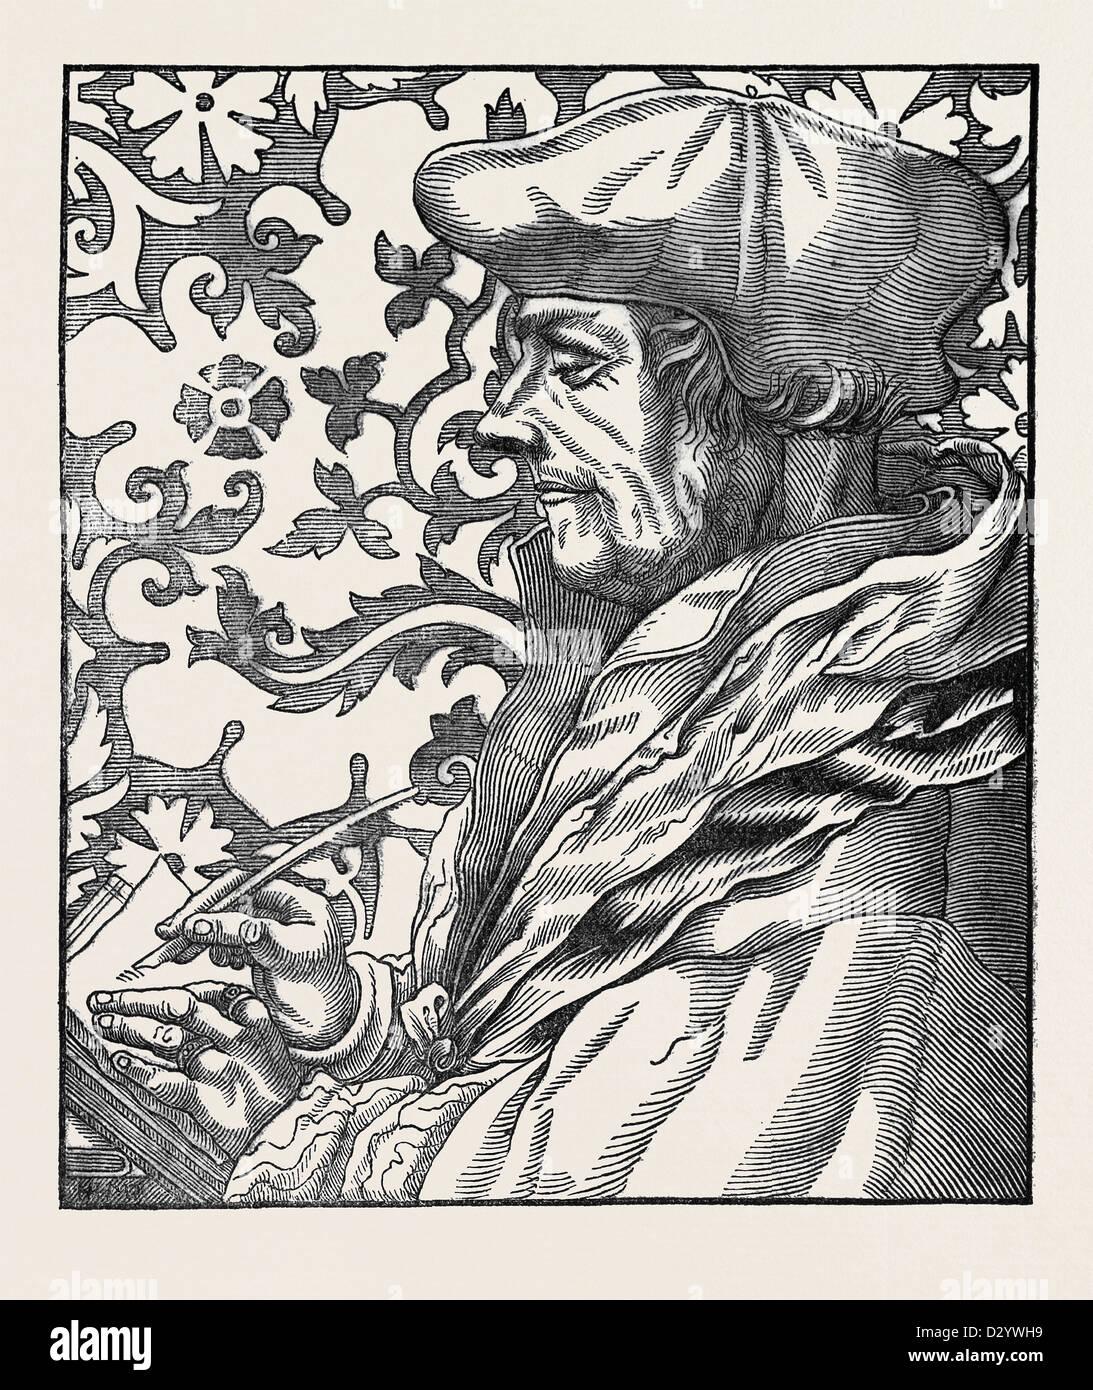 ERASMUS AFTER HOLBEIN. - Stock Image